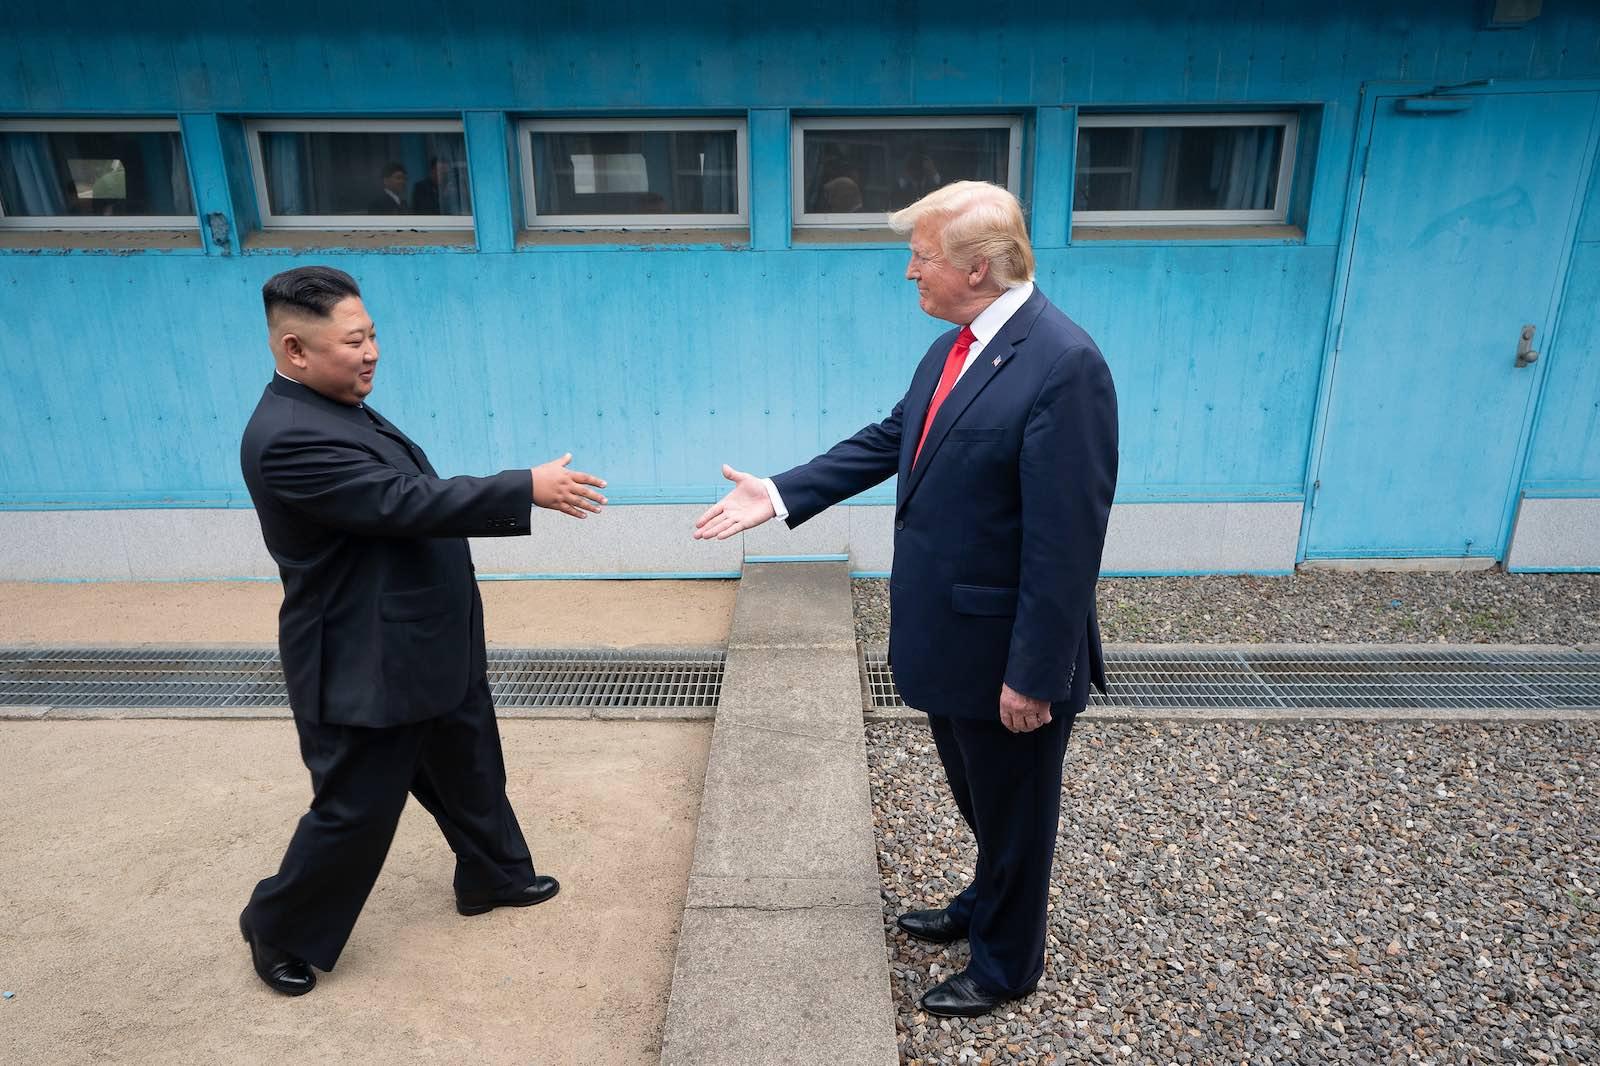 A handshake across the DMZ (White House/Flickr)